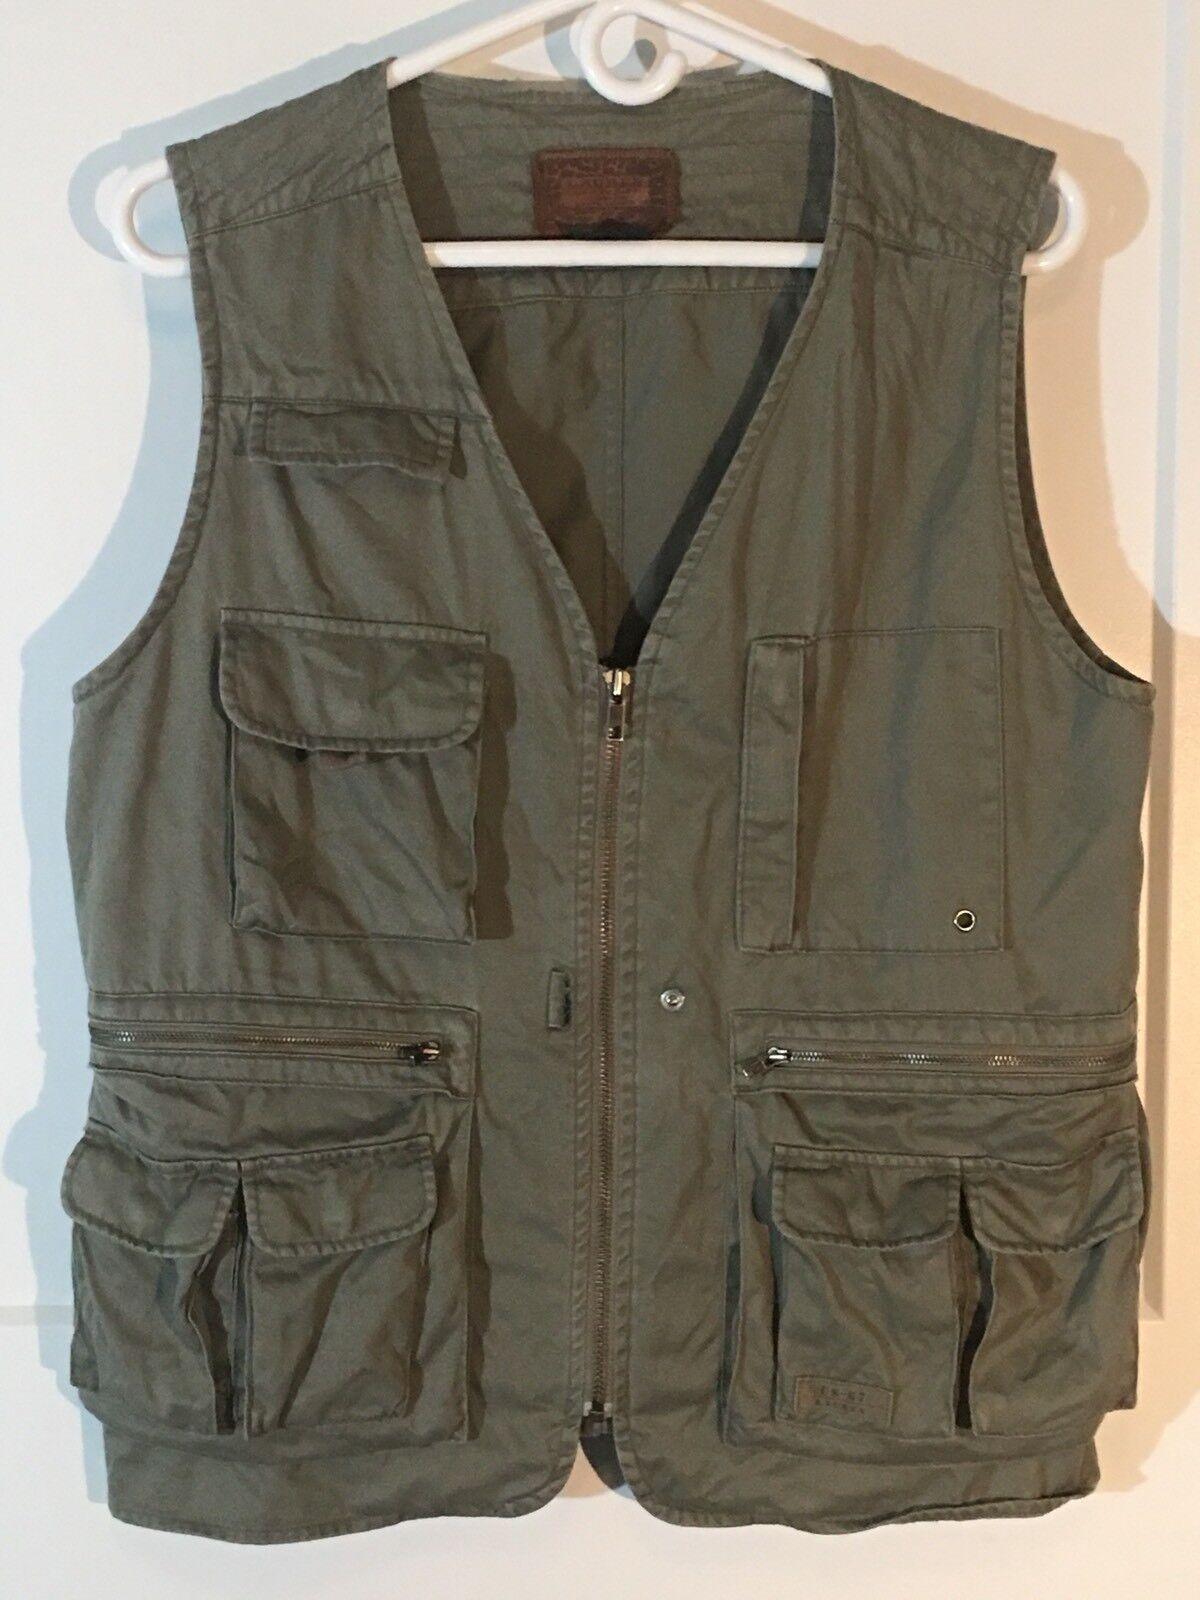 Ralph Lauren Größe S Sportsman Outfitter Vest Grün Khaki Fishing Photography Vtg